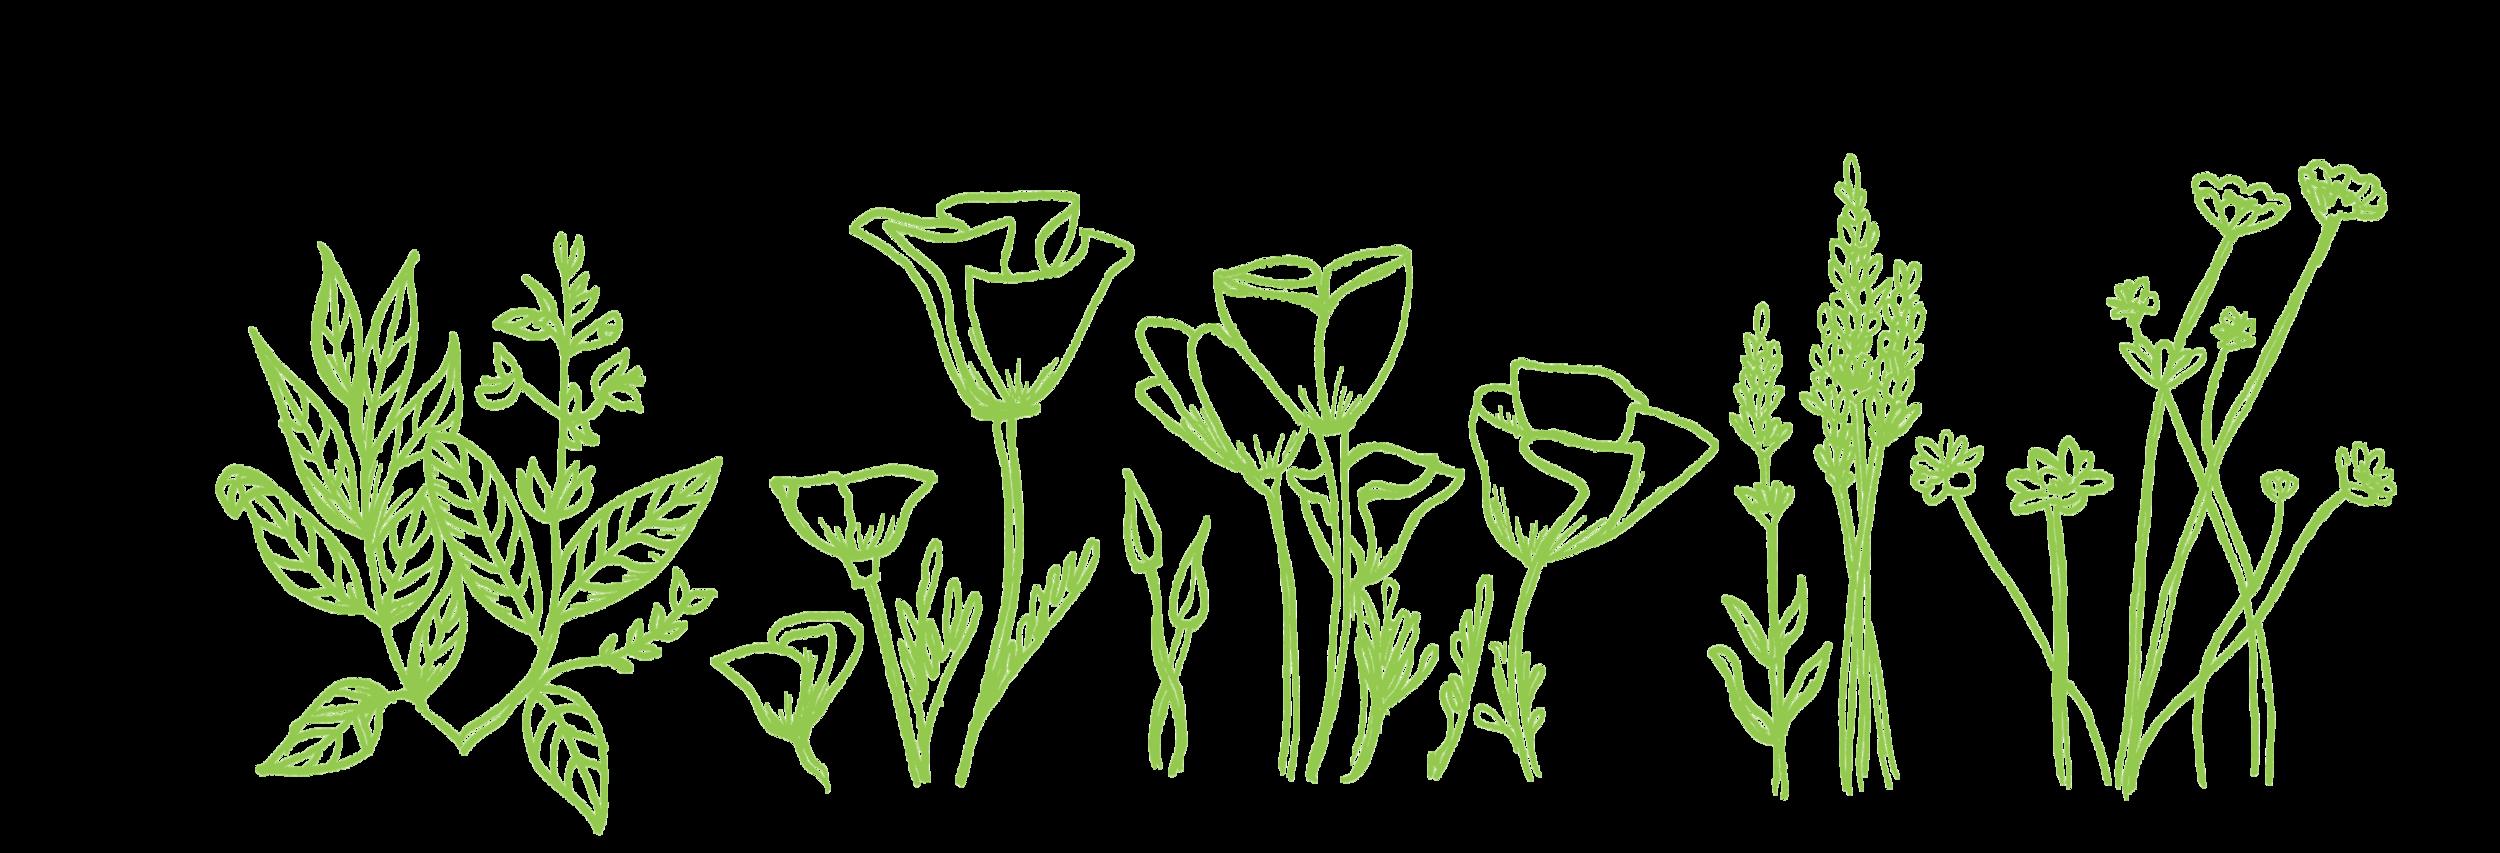 plants_green.png